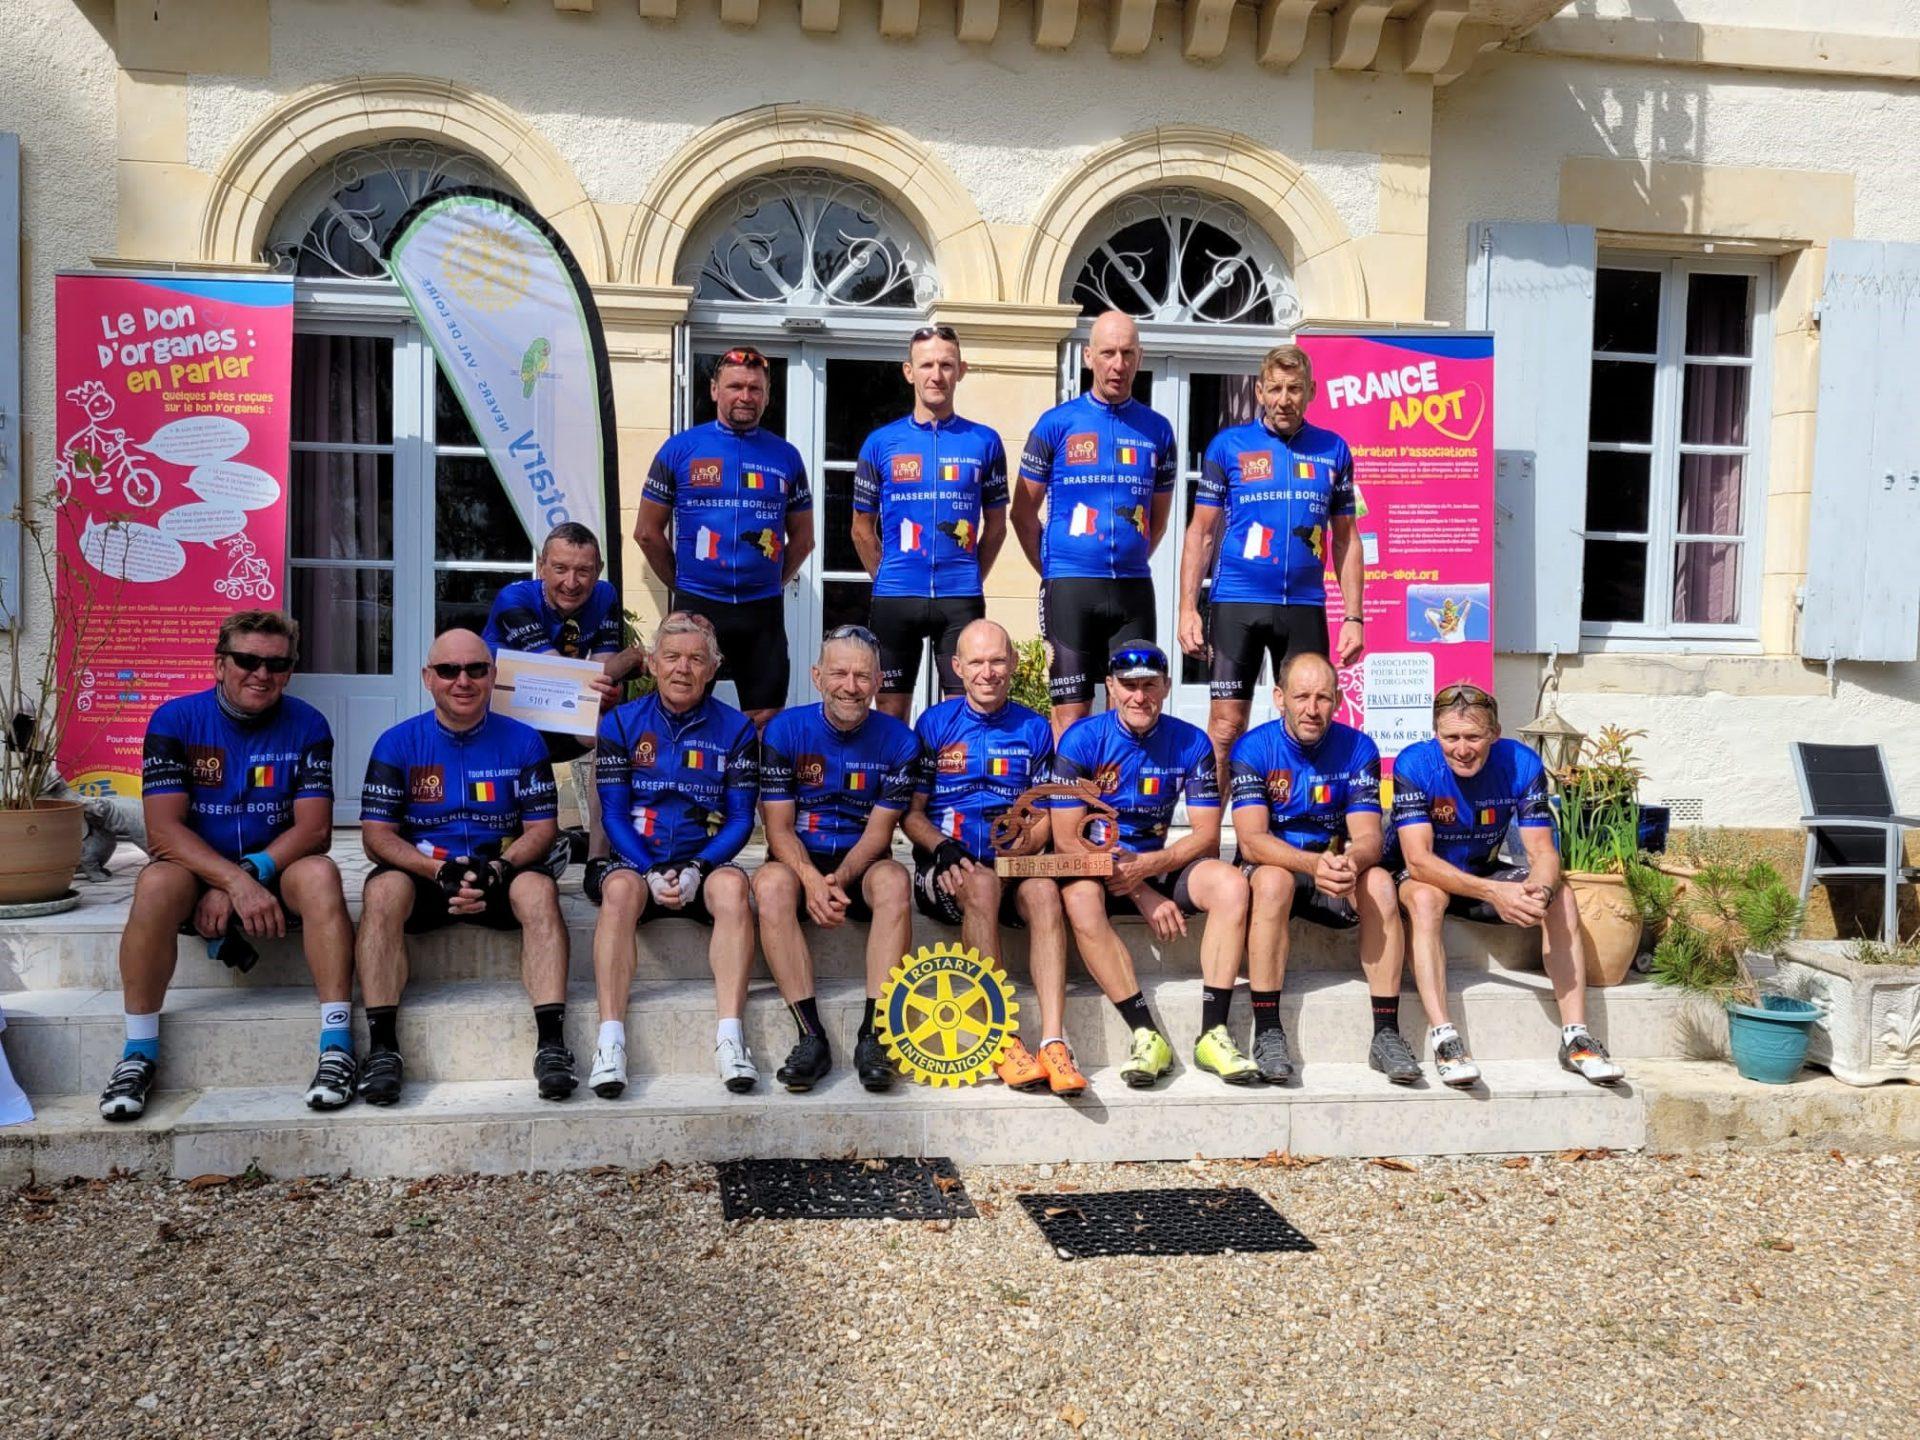 Enthousiaste fietsers leggen 580 kilometer af voor Borstkliniek